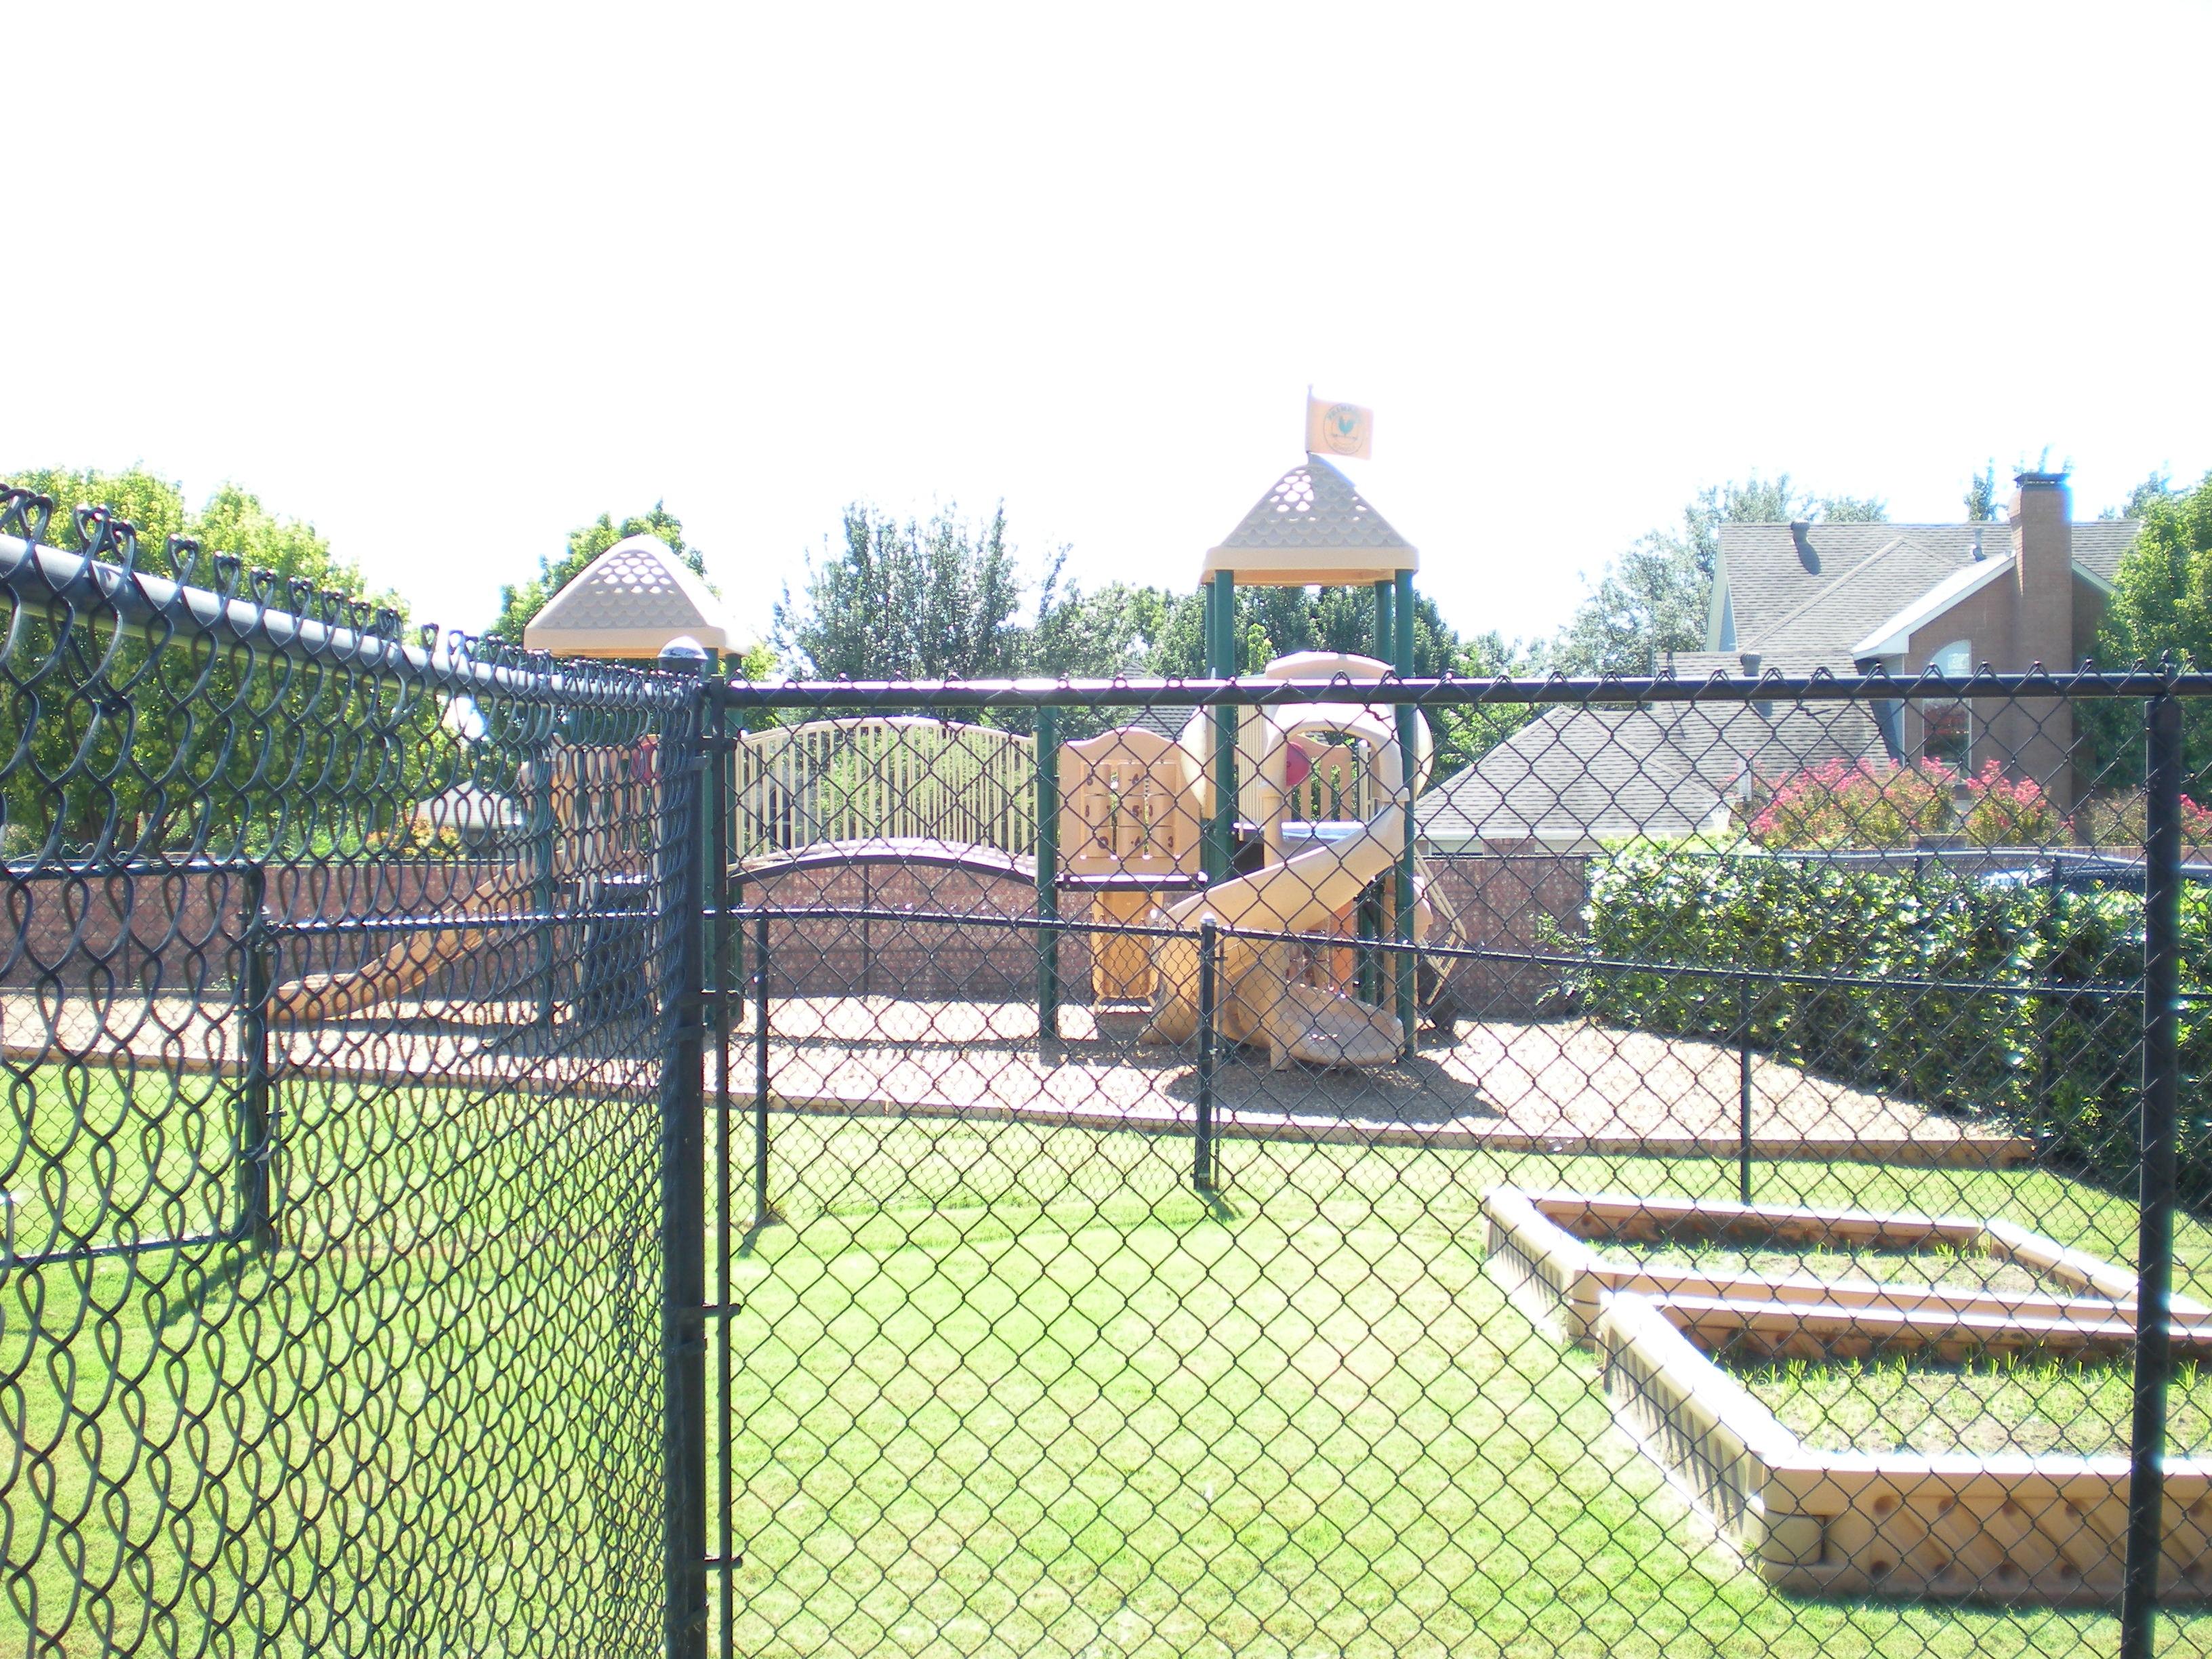 Primrose School of Rockwall image 4